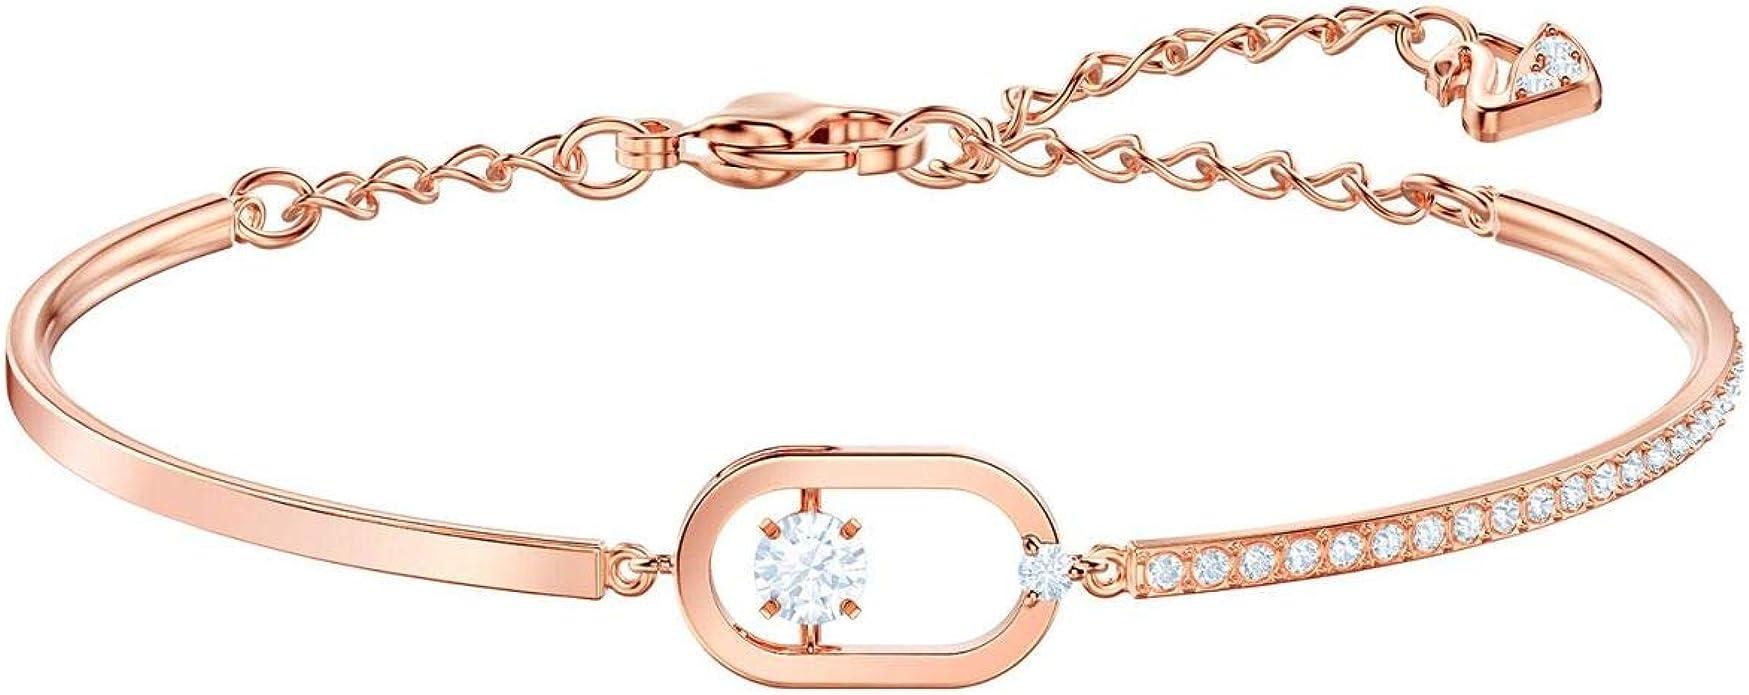 Swarovski North Bracelet, White, Rose Gold Plating